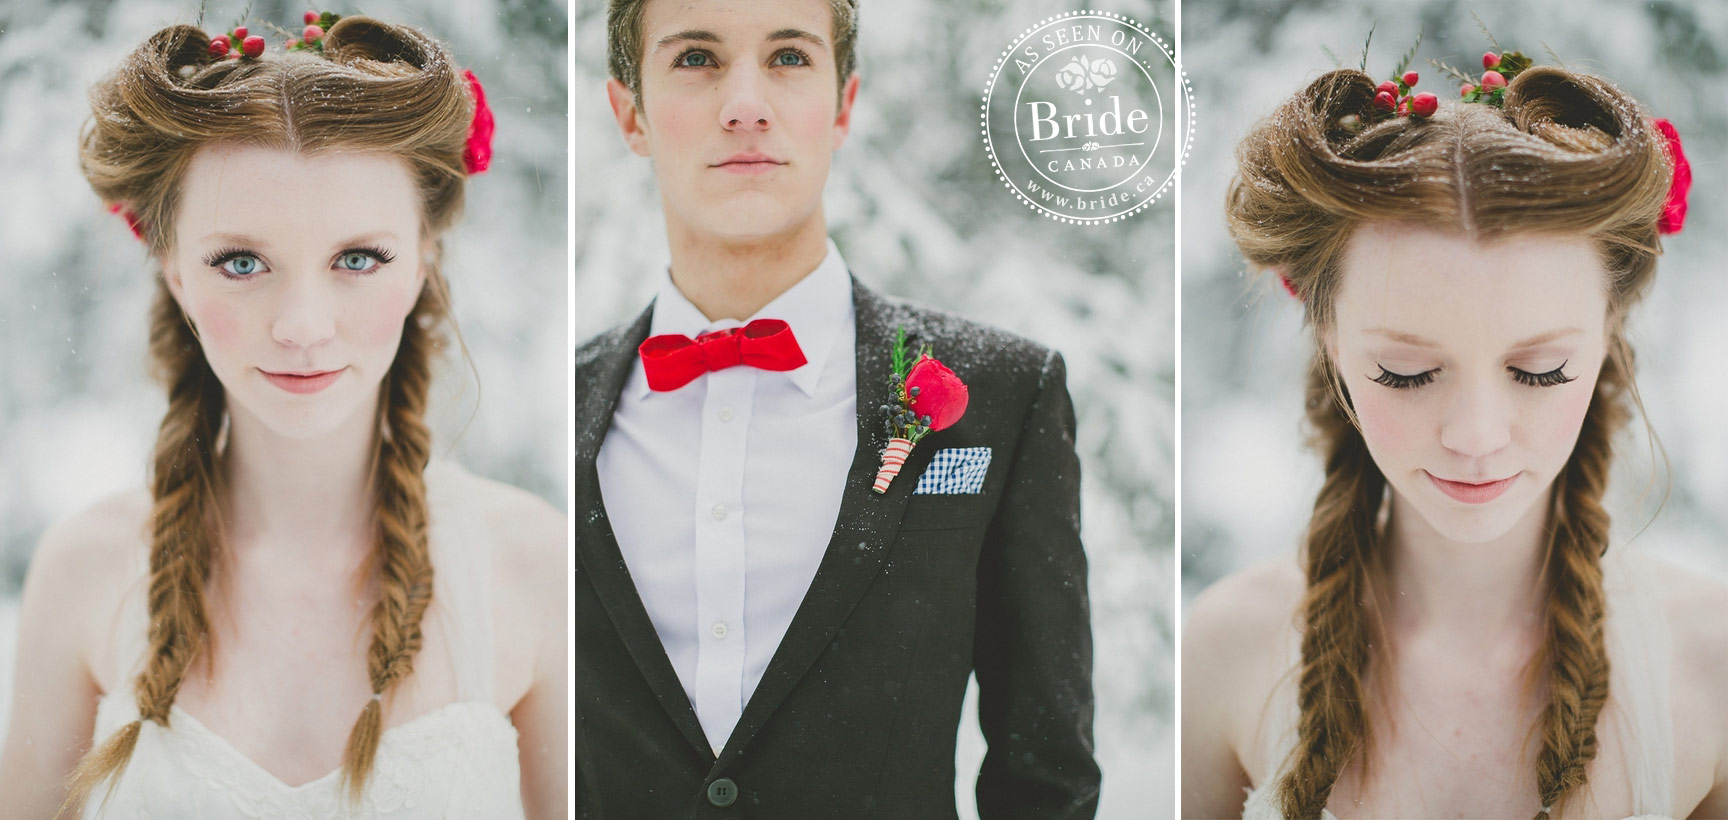 bride.ca   Wedding Trends & Wedding Ideas in Canada about \'bouquet\'